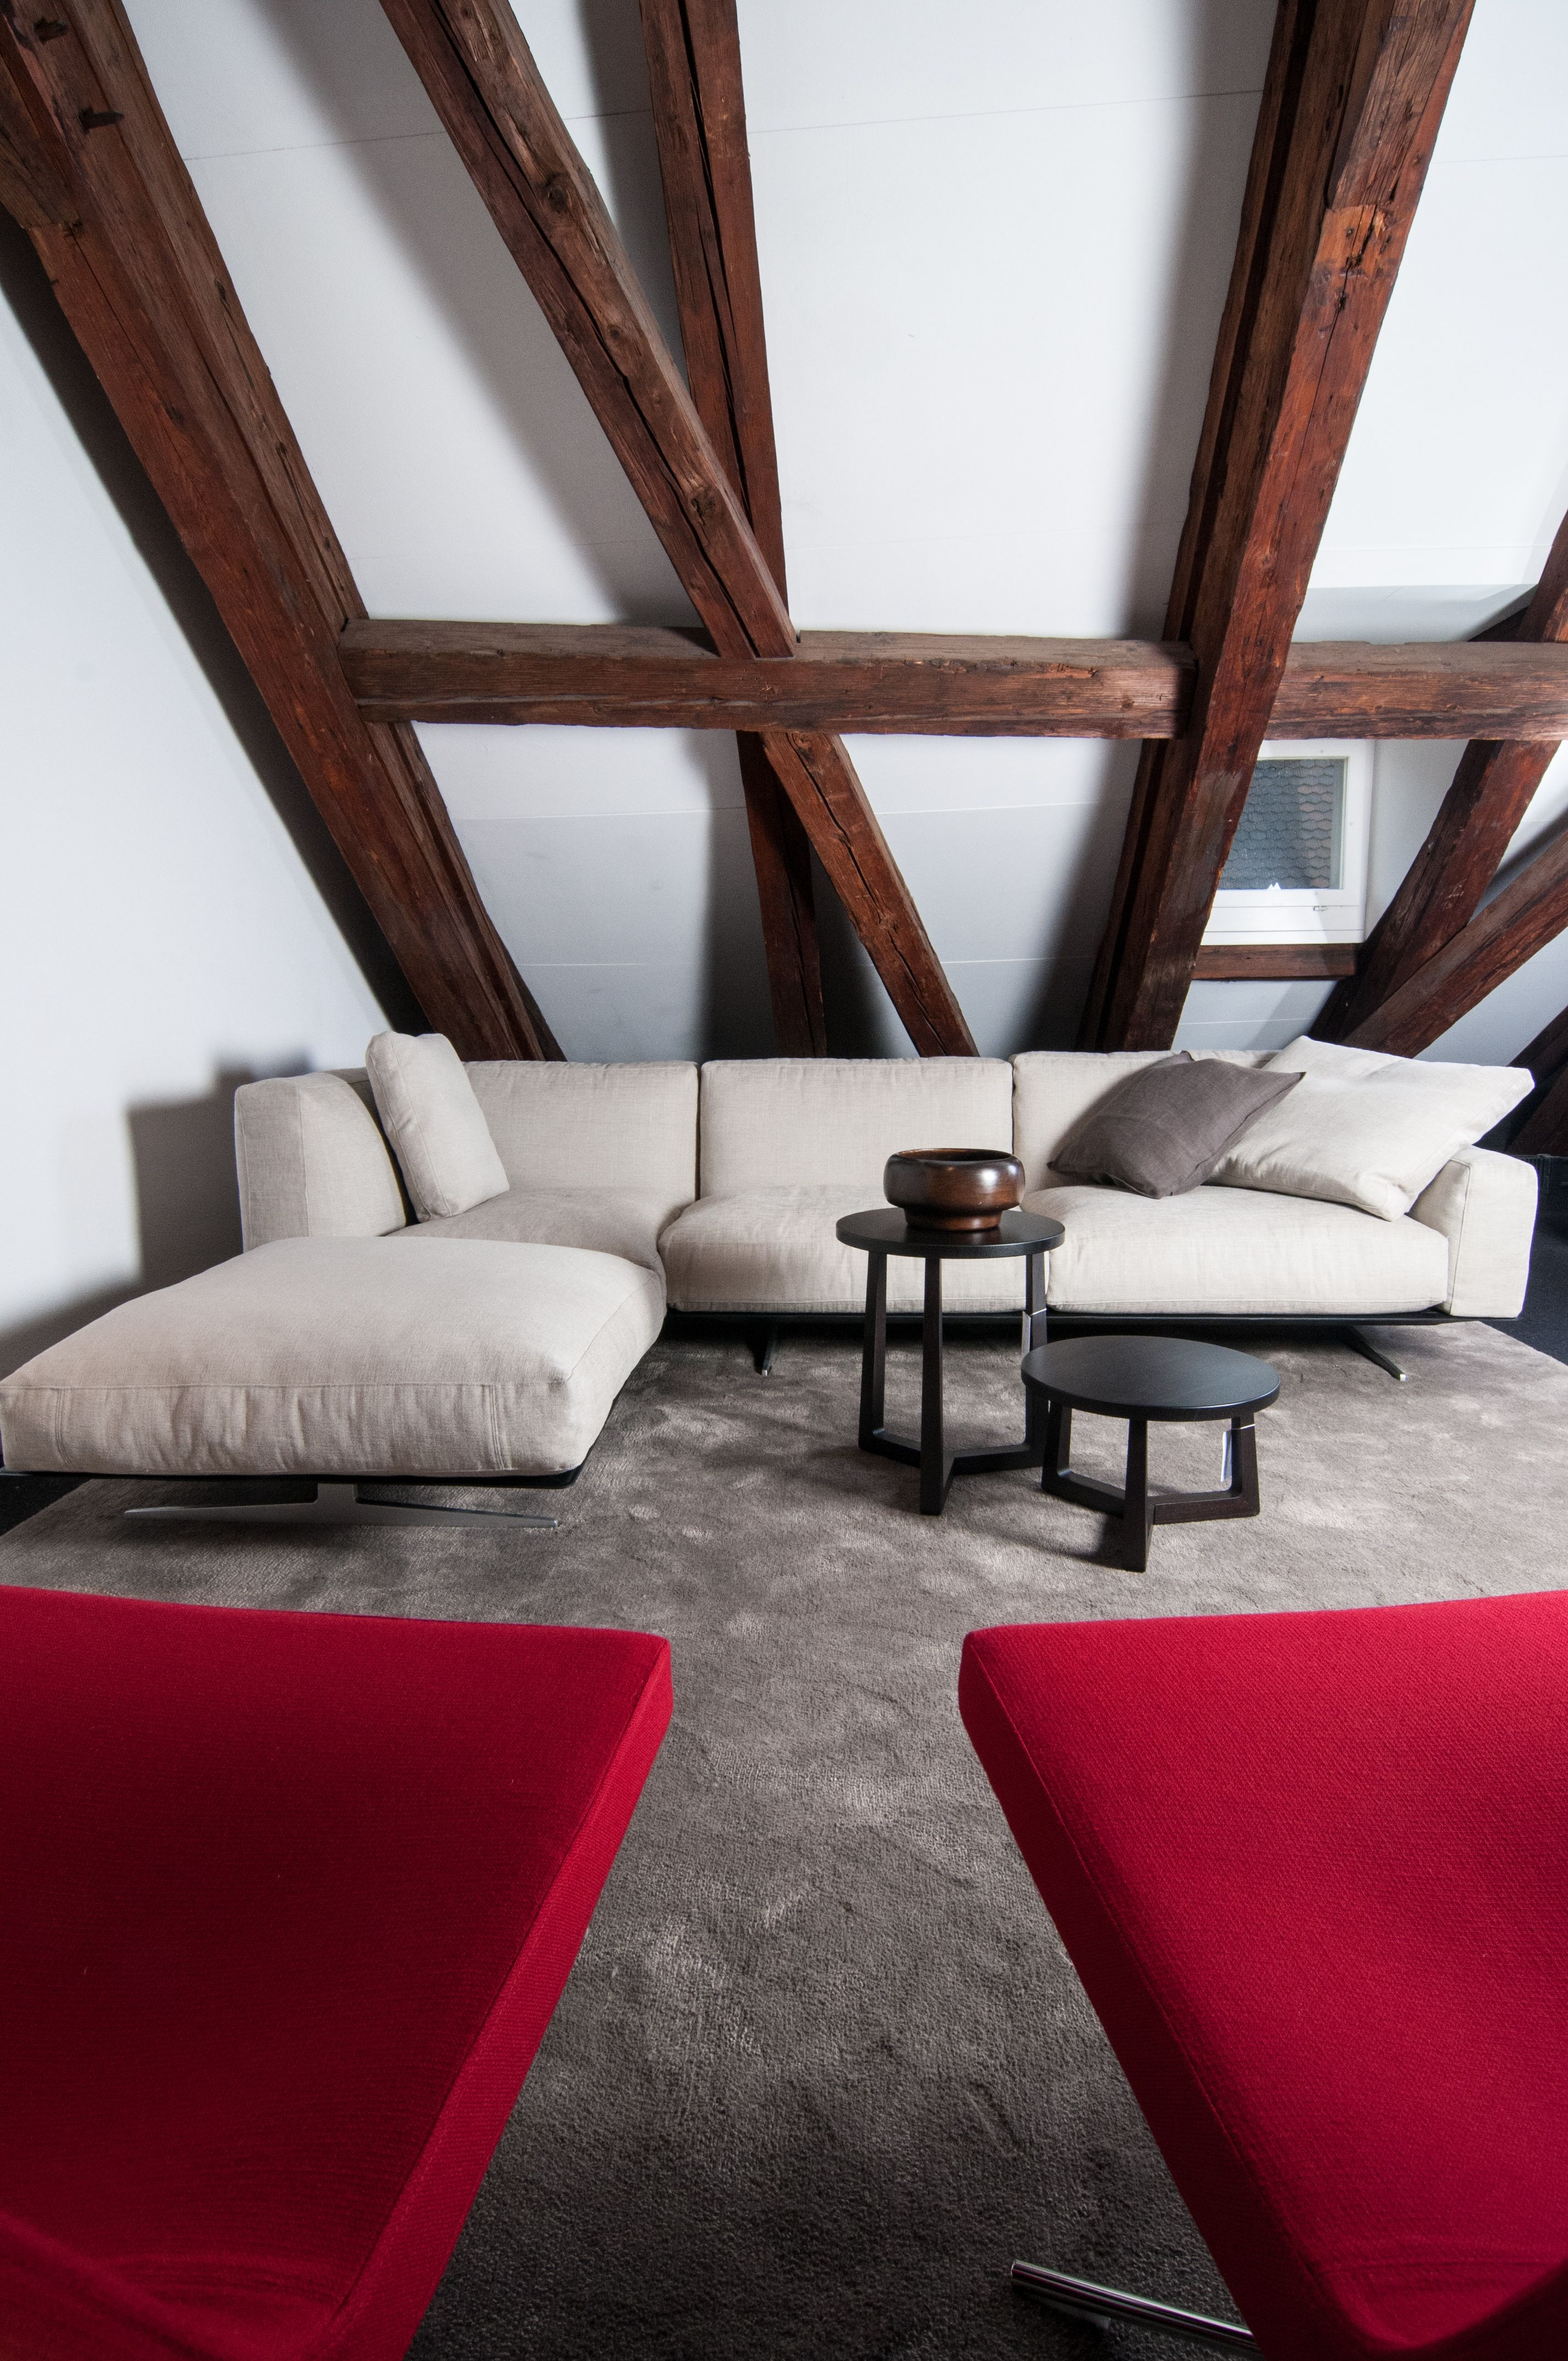 Wohnideen Luzern wohnidee luzern got wood woods and interiors